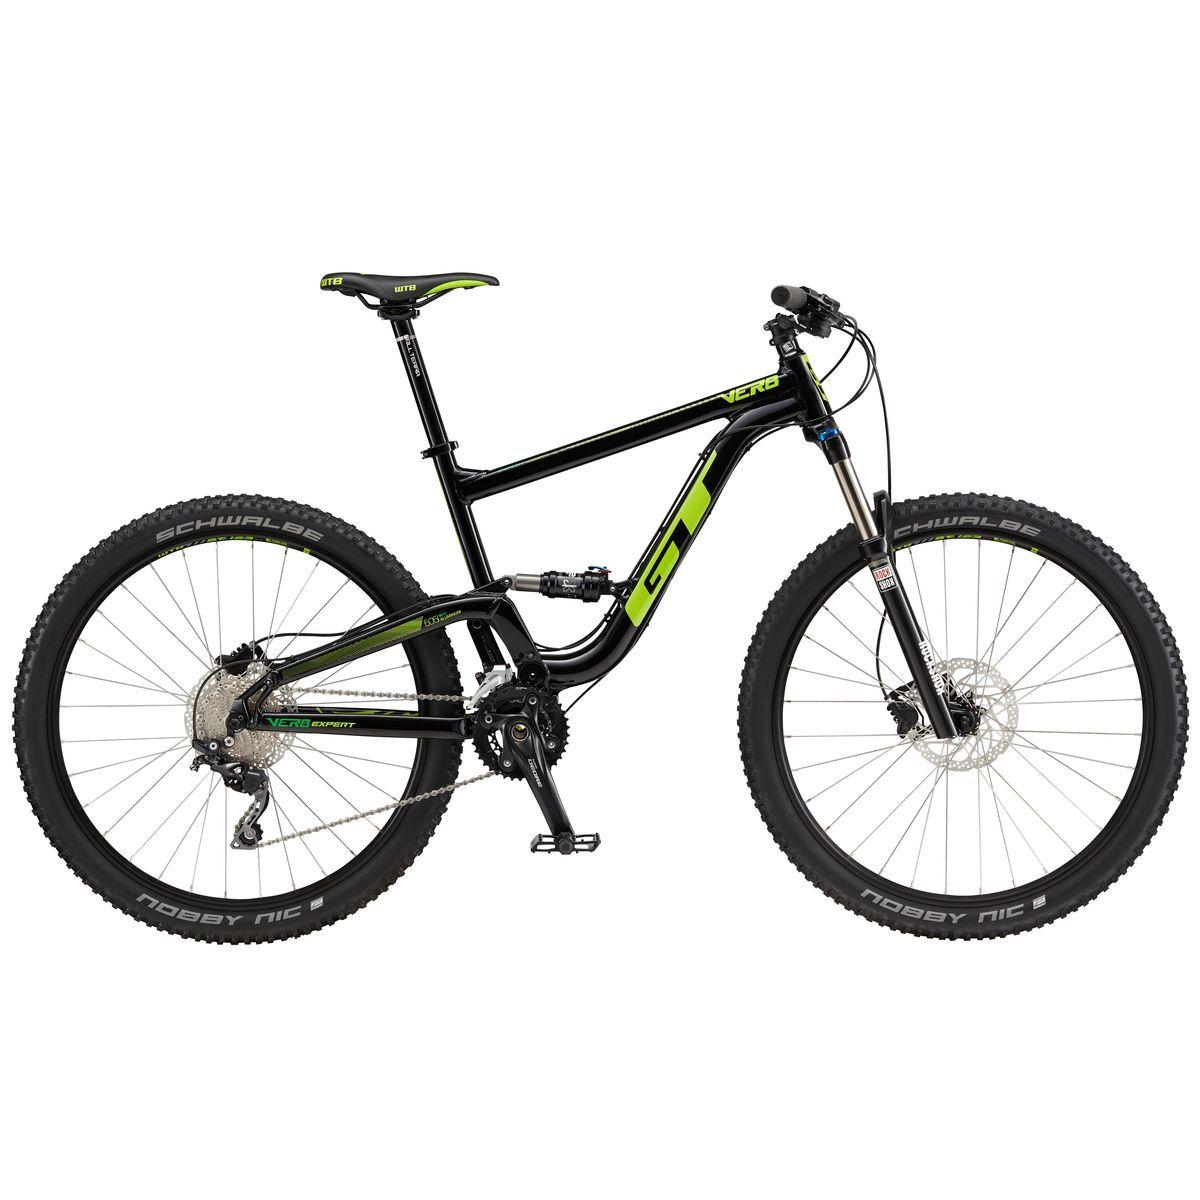 GT Verb Expert Complete Mountain Bike 2017 trail